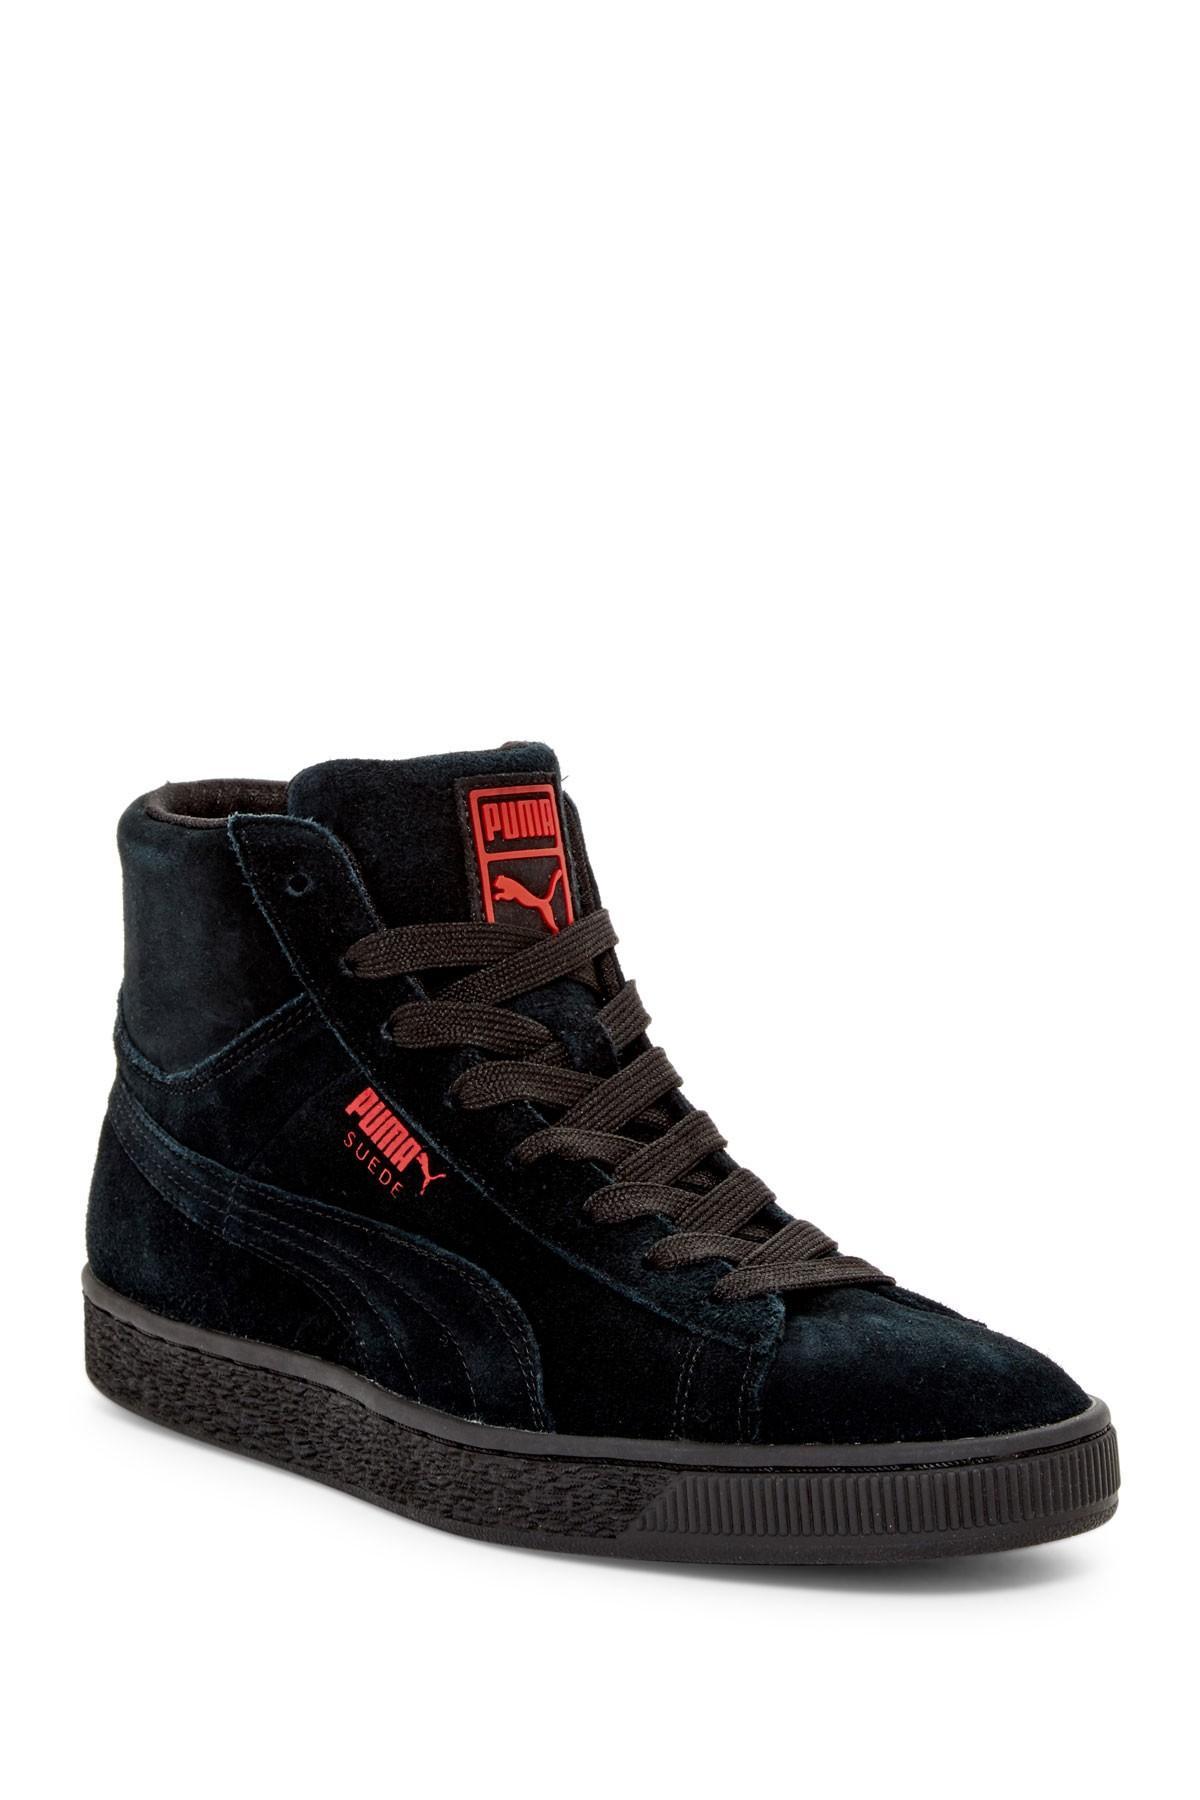 puma wog hightop sneaker in black for men lyst